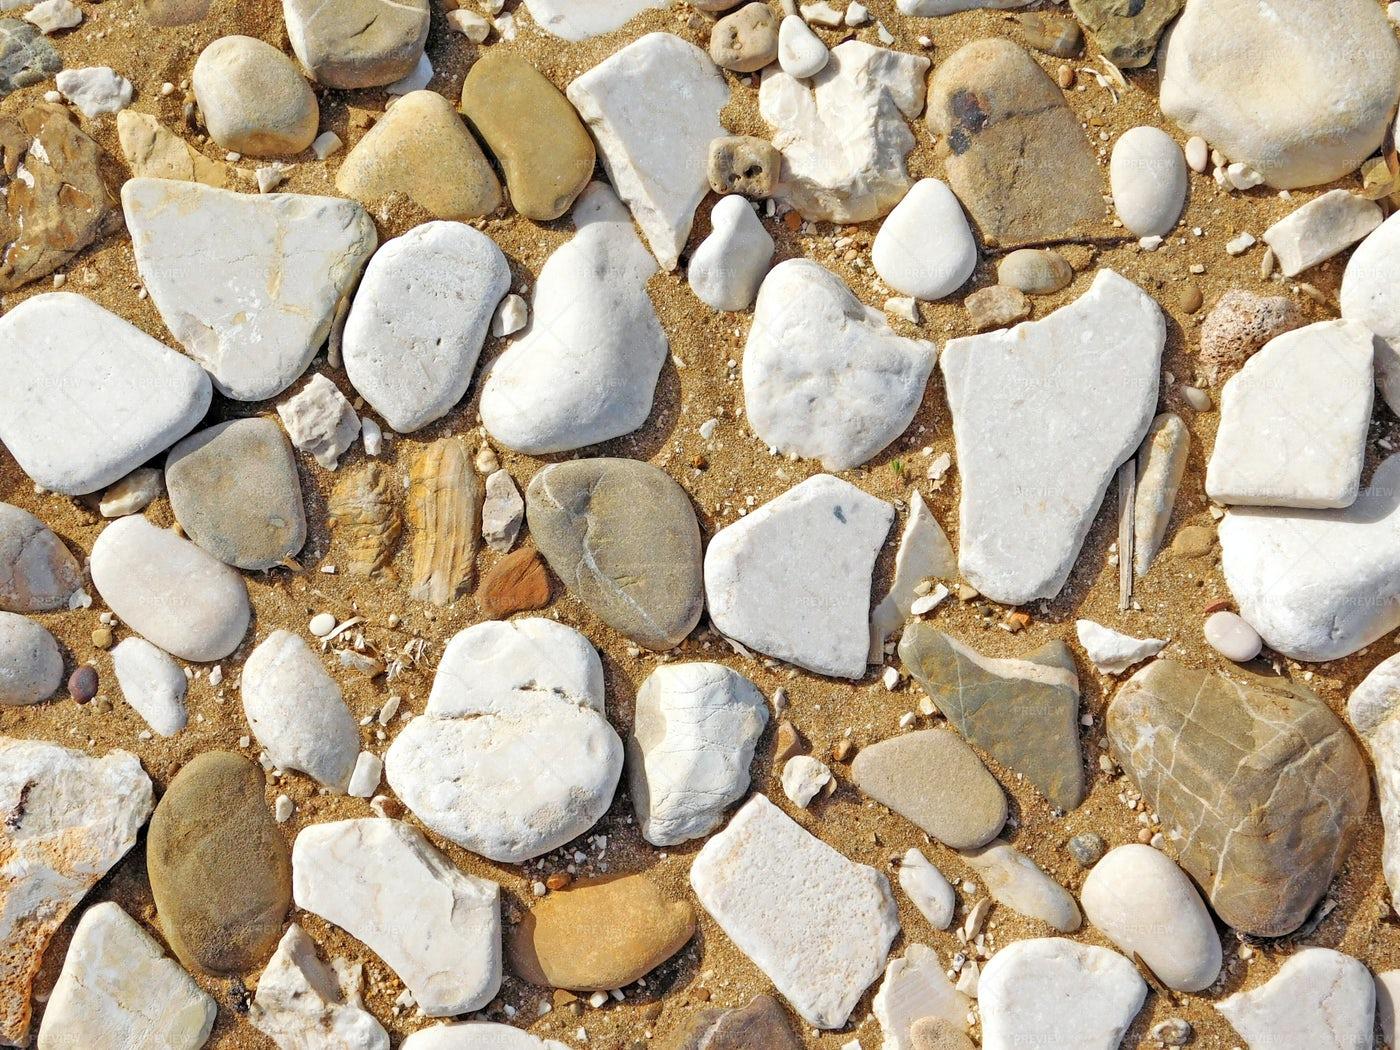 Stones At The Beach: Stock Photos